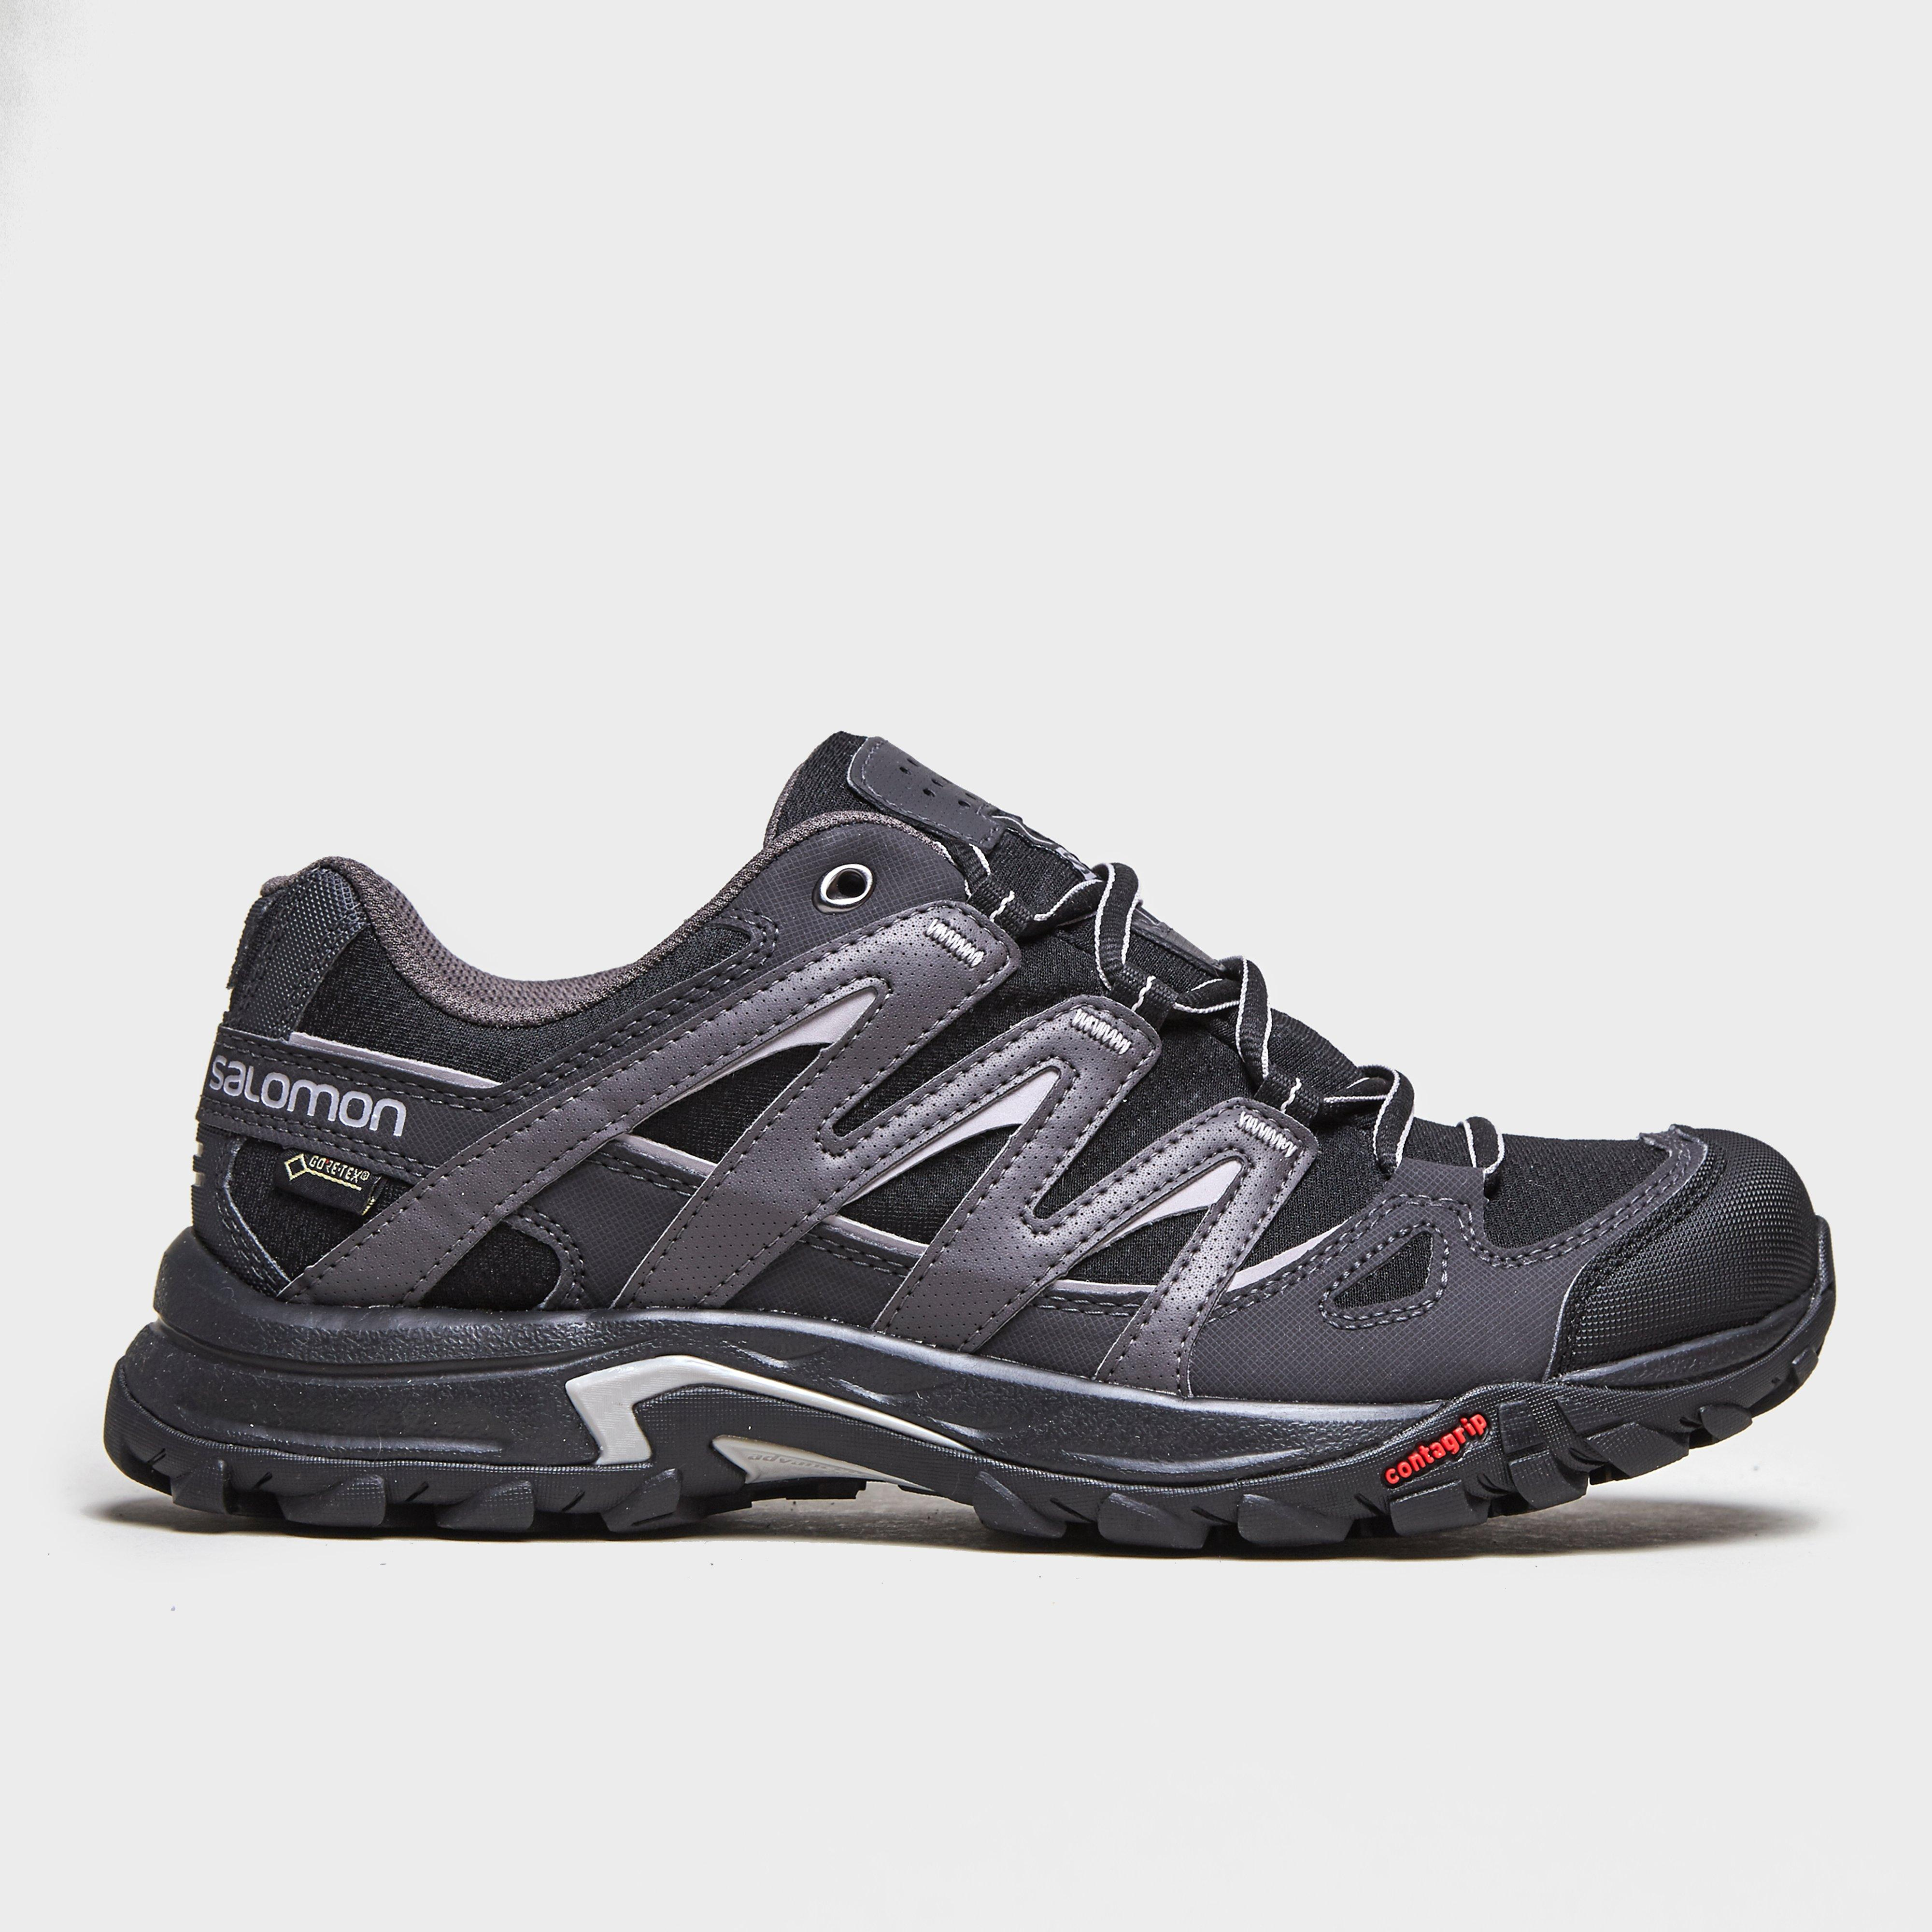 Salomon Men s Eskape GORE-TEX® Hiking Shoe f69d966b4fd68